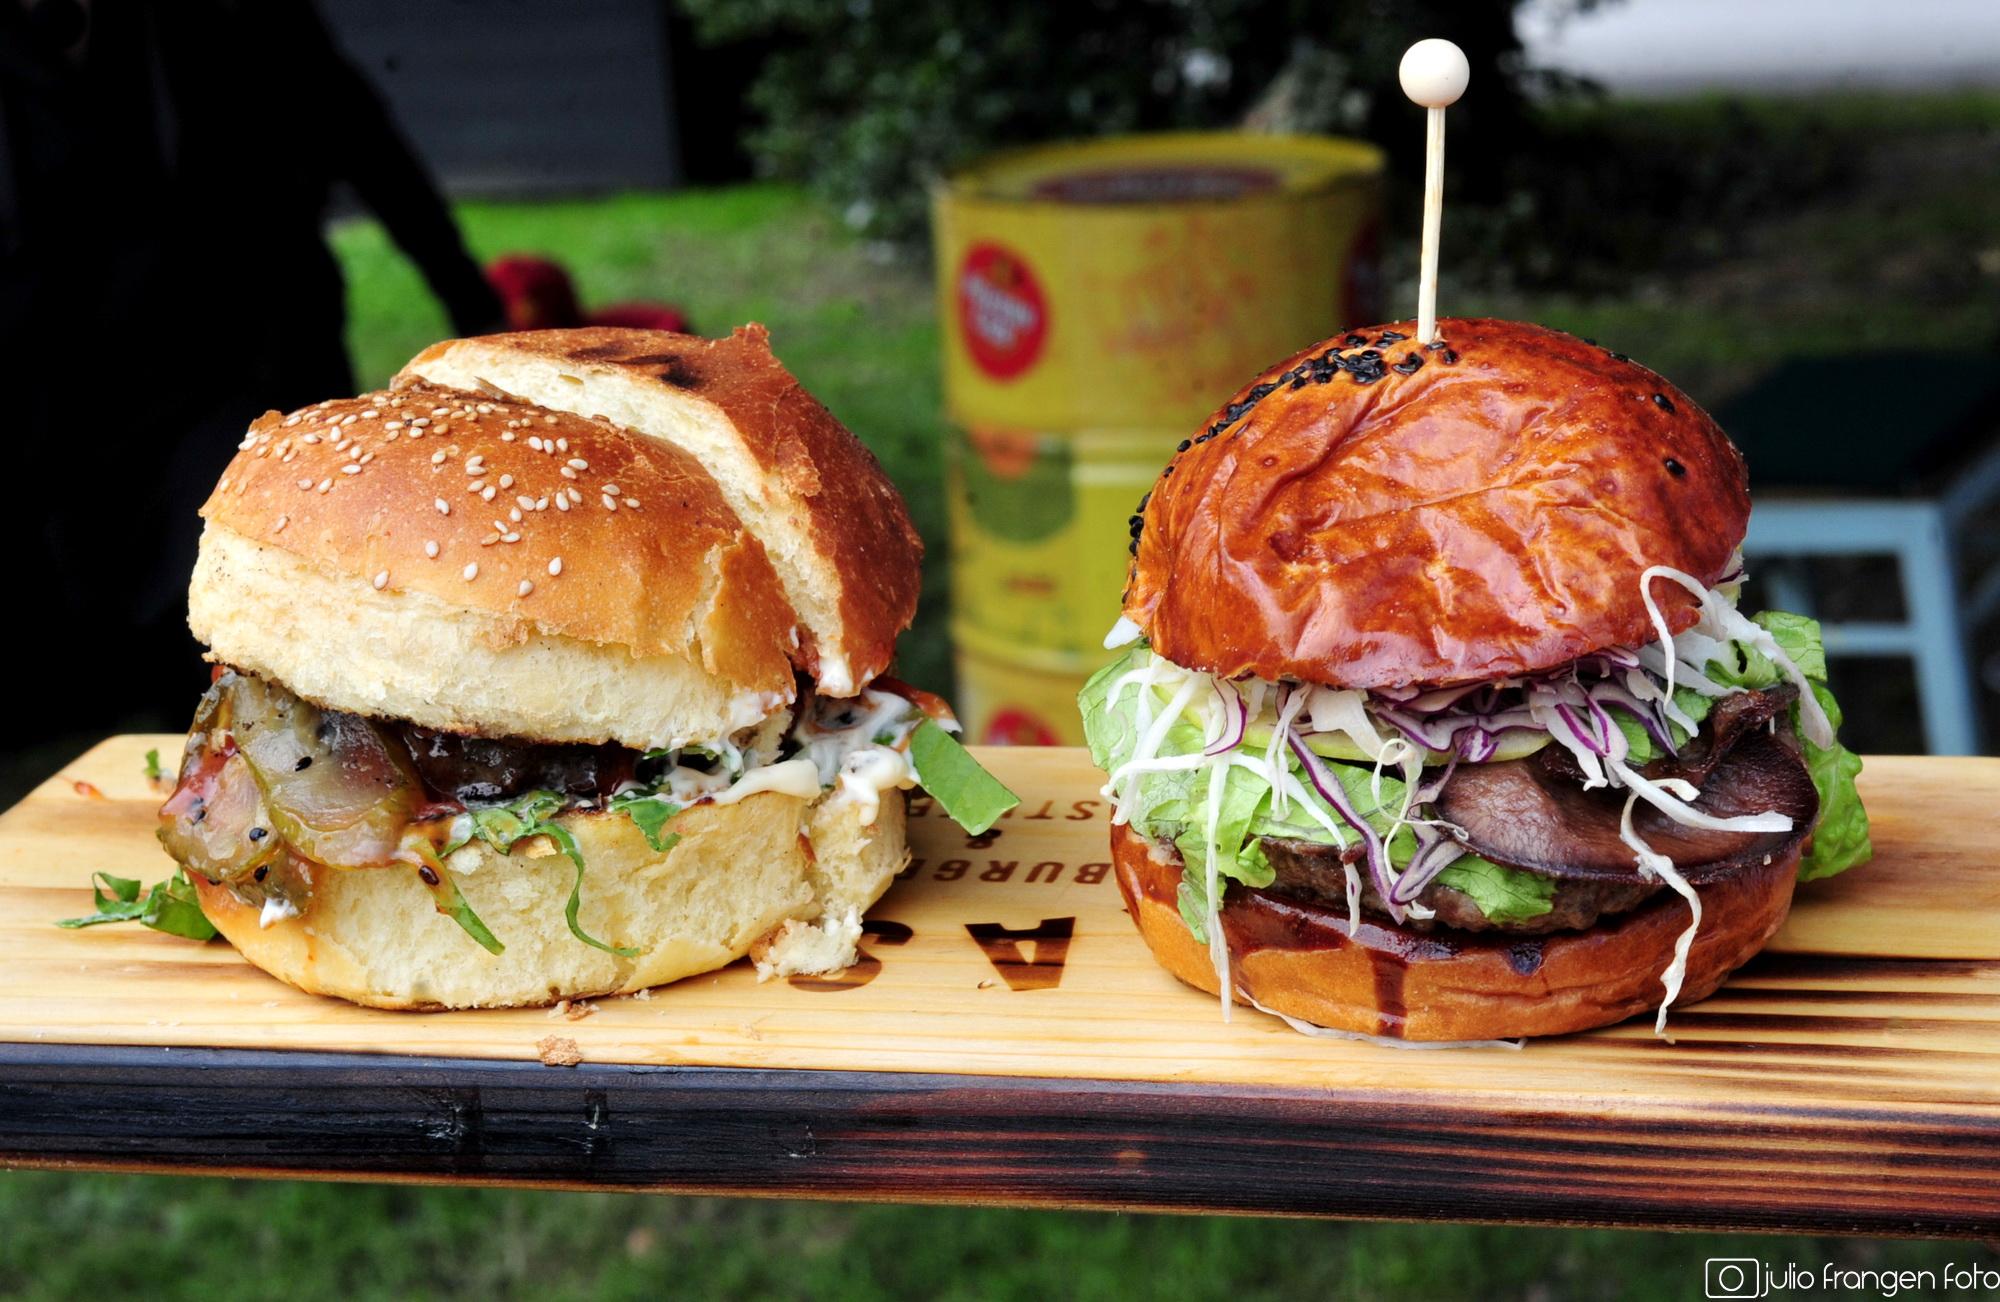 Zagreb Burger Festival powered by Heinz